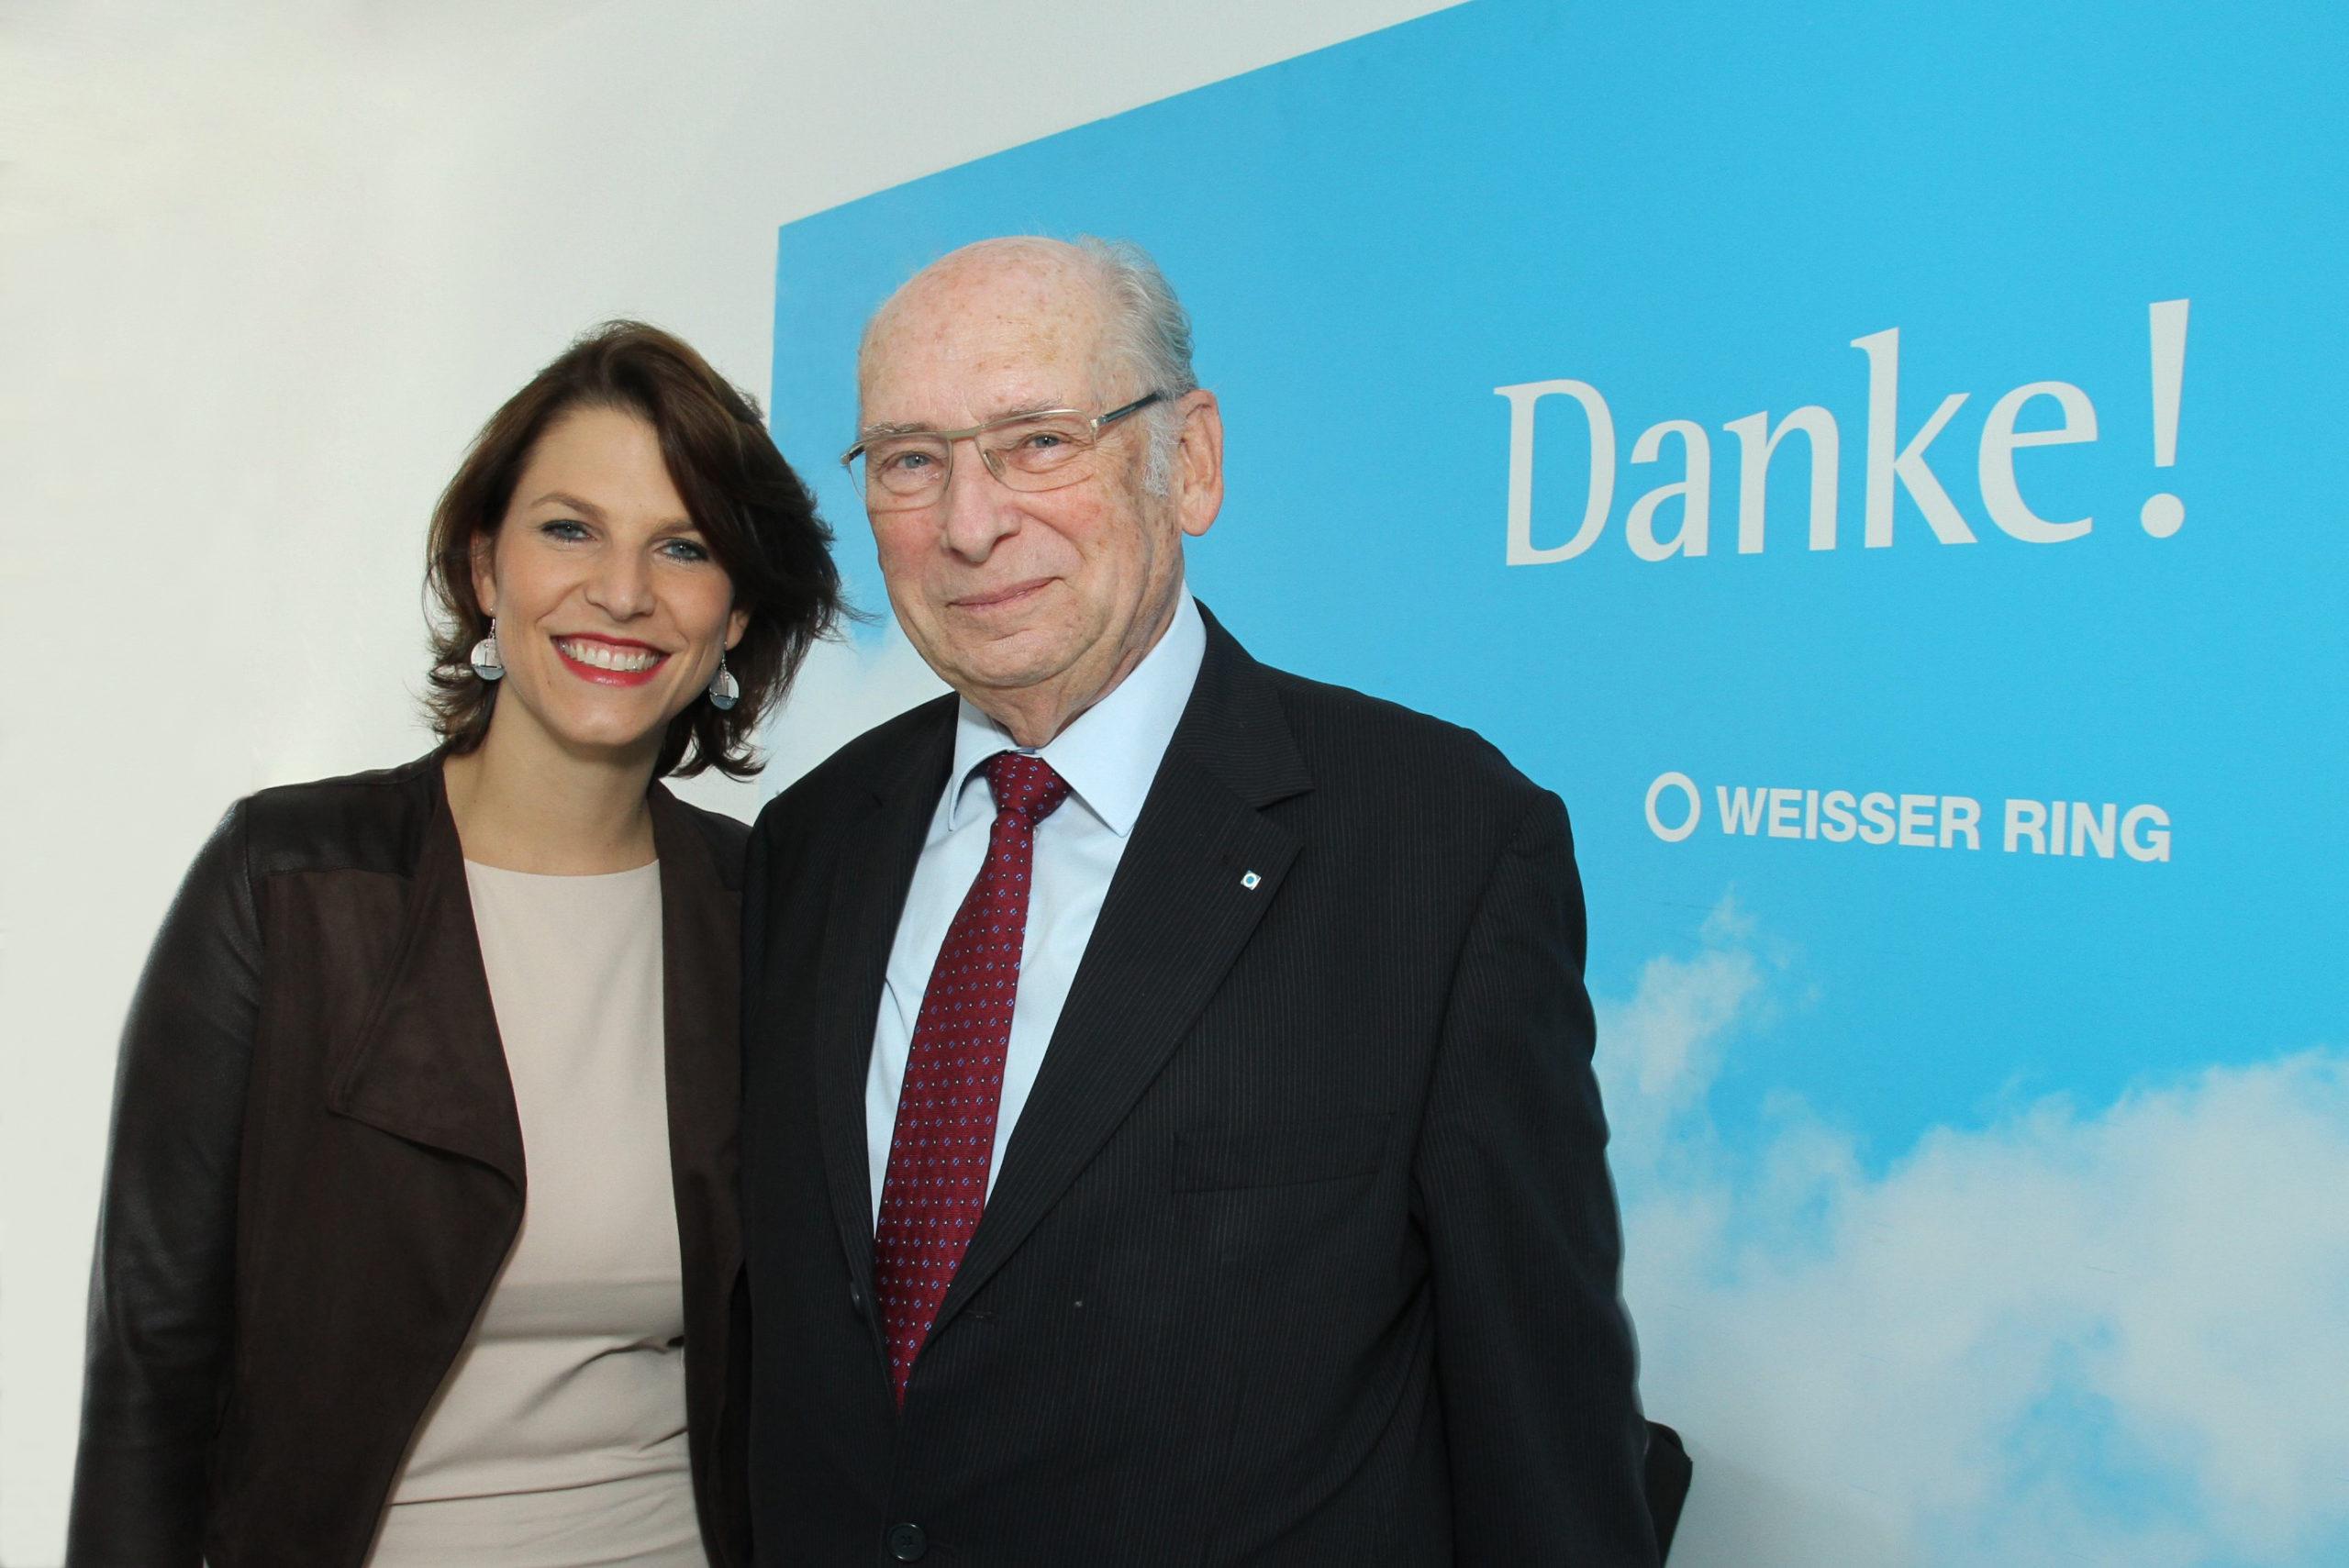 Staatssekretärin Karoline Edtstadler und Präsident Udo Jesionek / Foto Willibald Haslinger